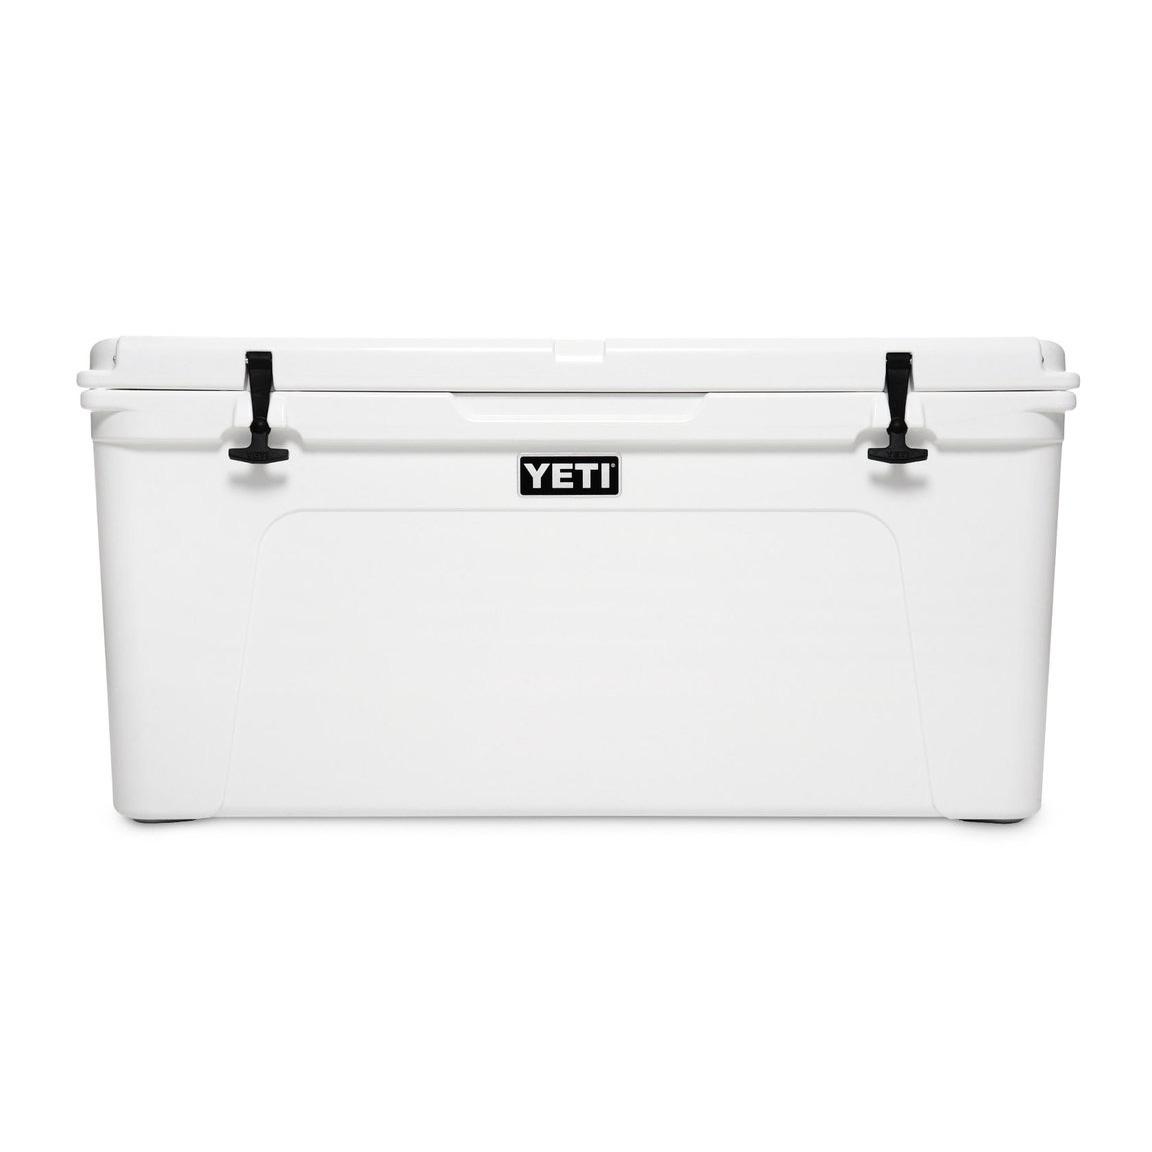 Yeti - Tundra 125 Hard Cooler